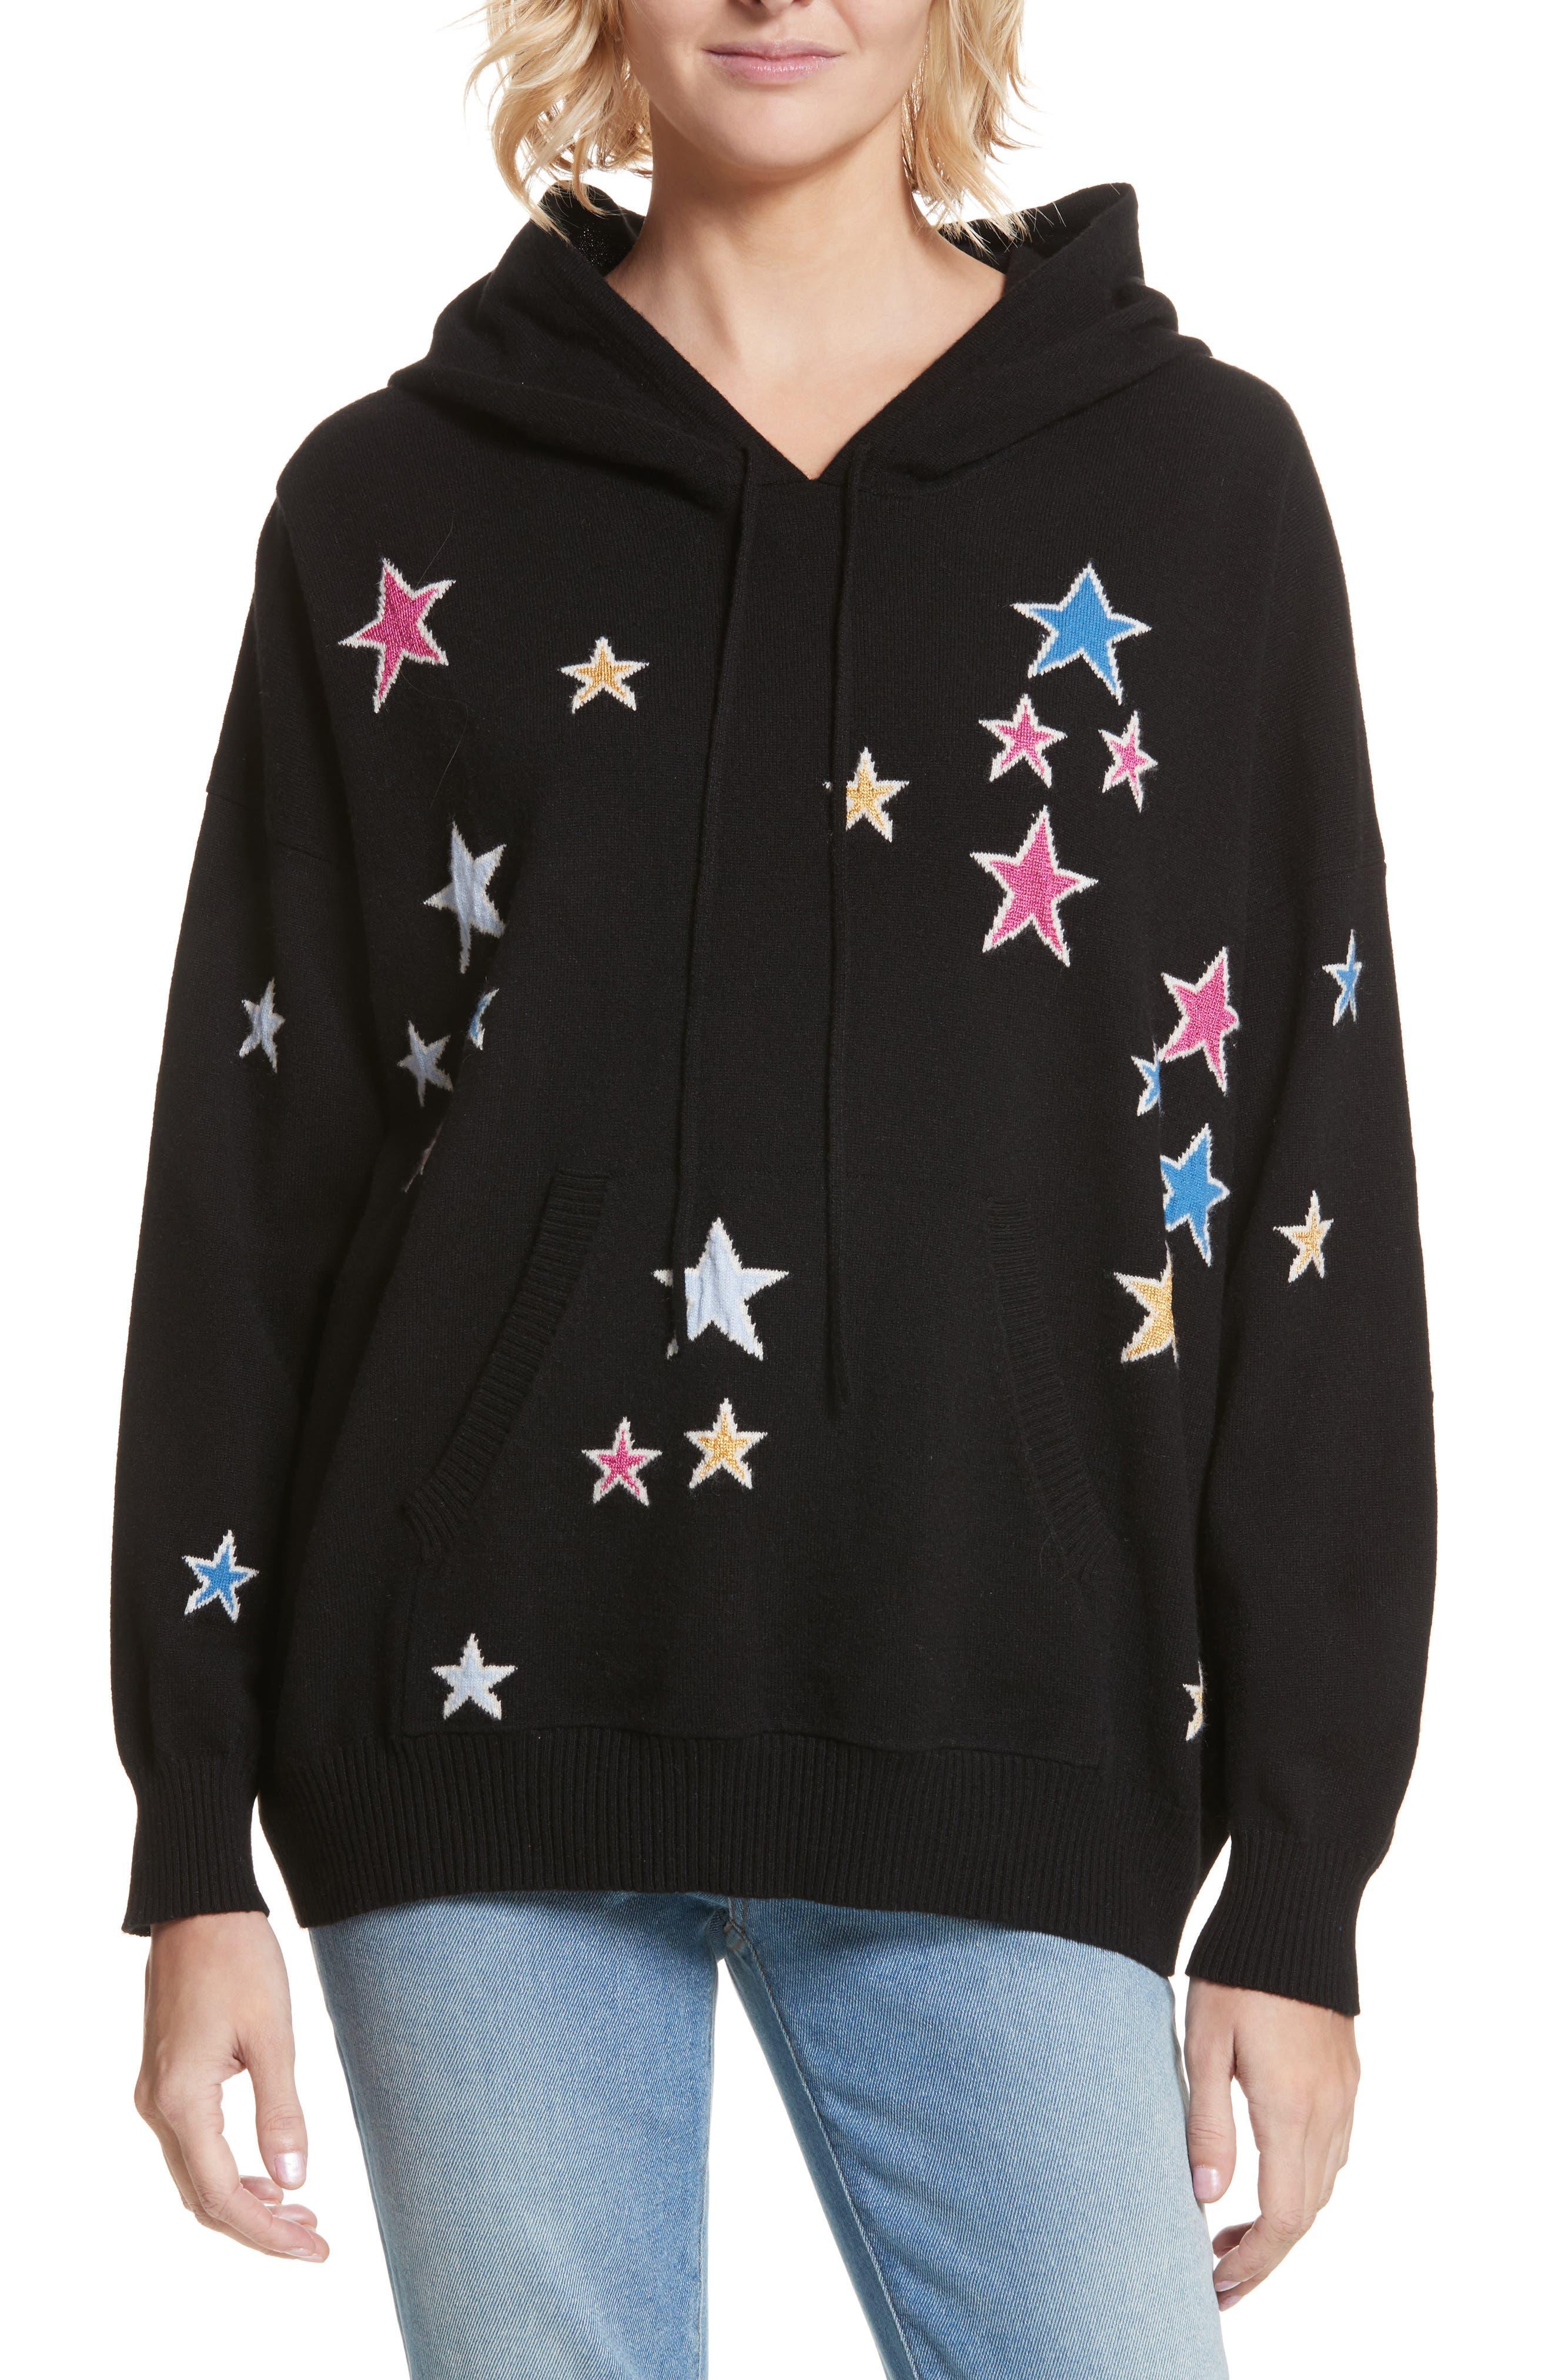 CHINTI & PARKER Acid Star Knit Cashmere Hoodie,                         Main,                         color, Black/ Multi